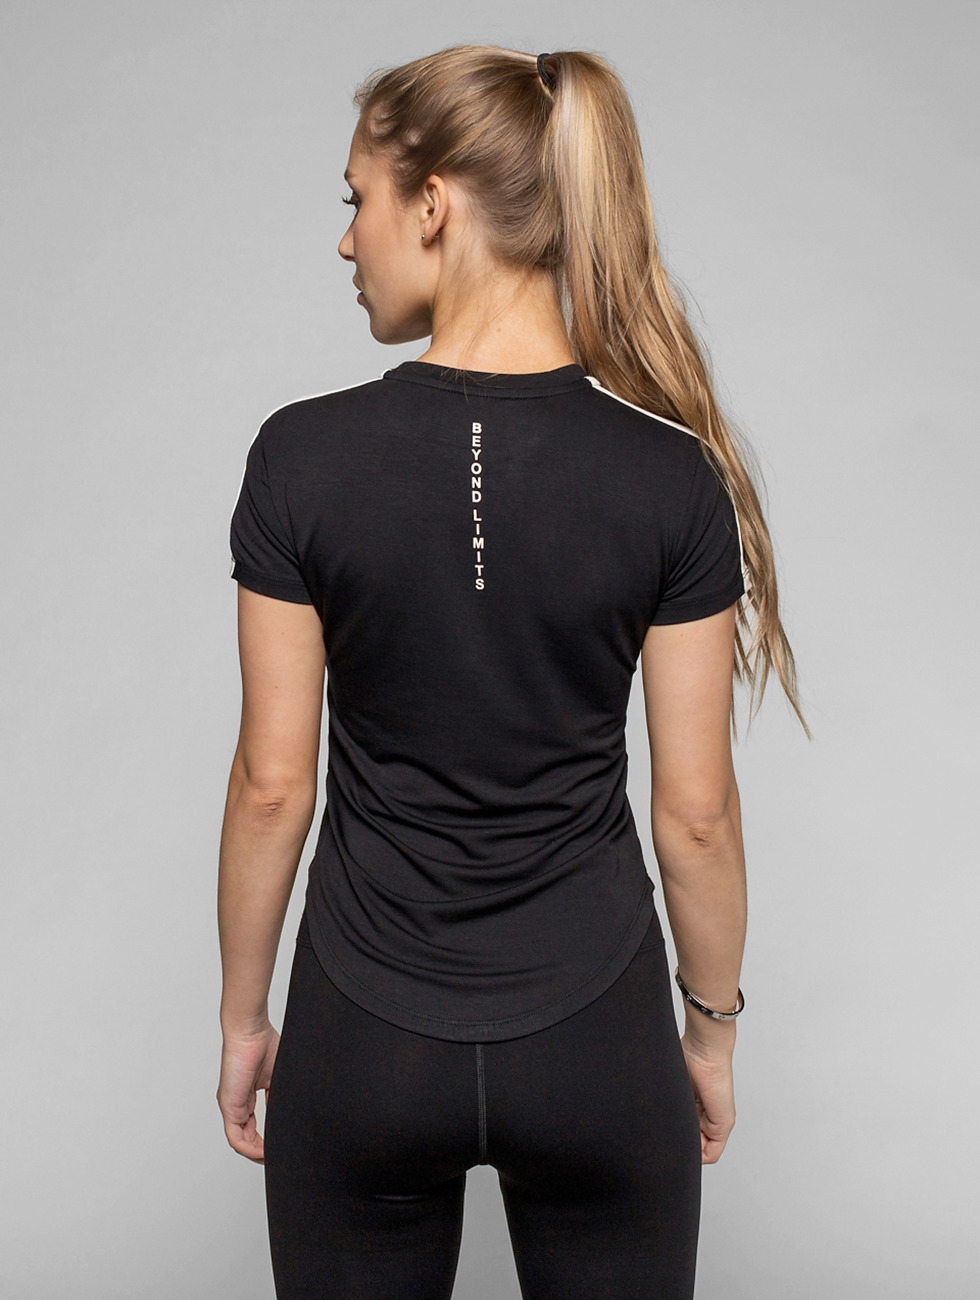 Beyond Limits T-Shirt Statement black